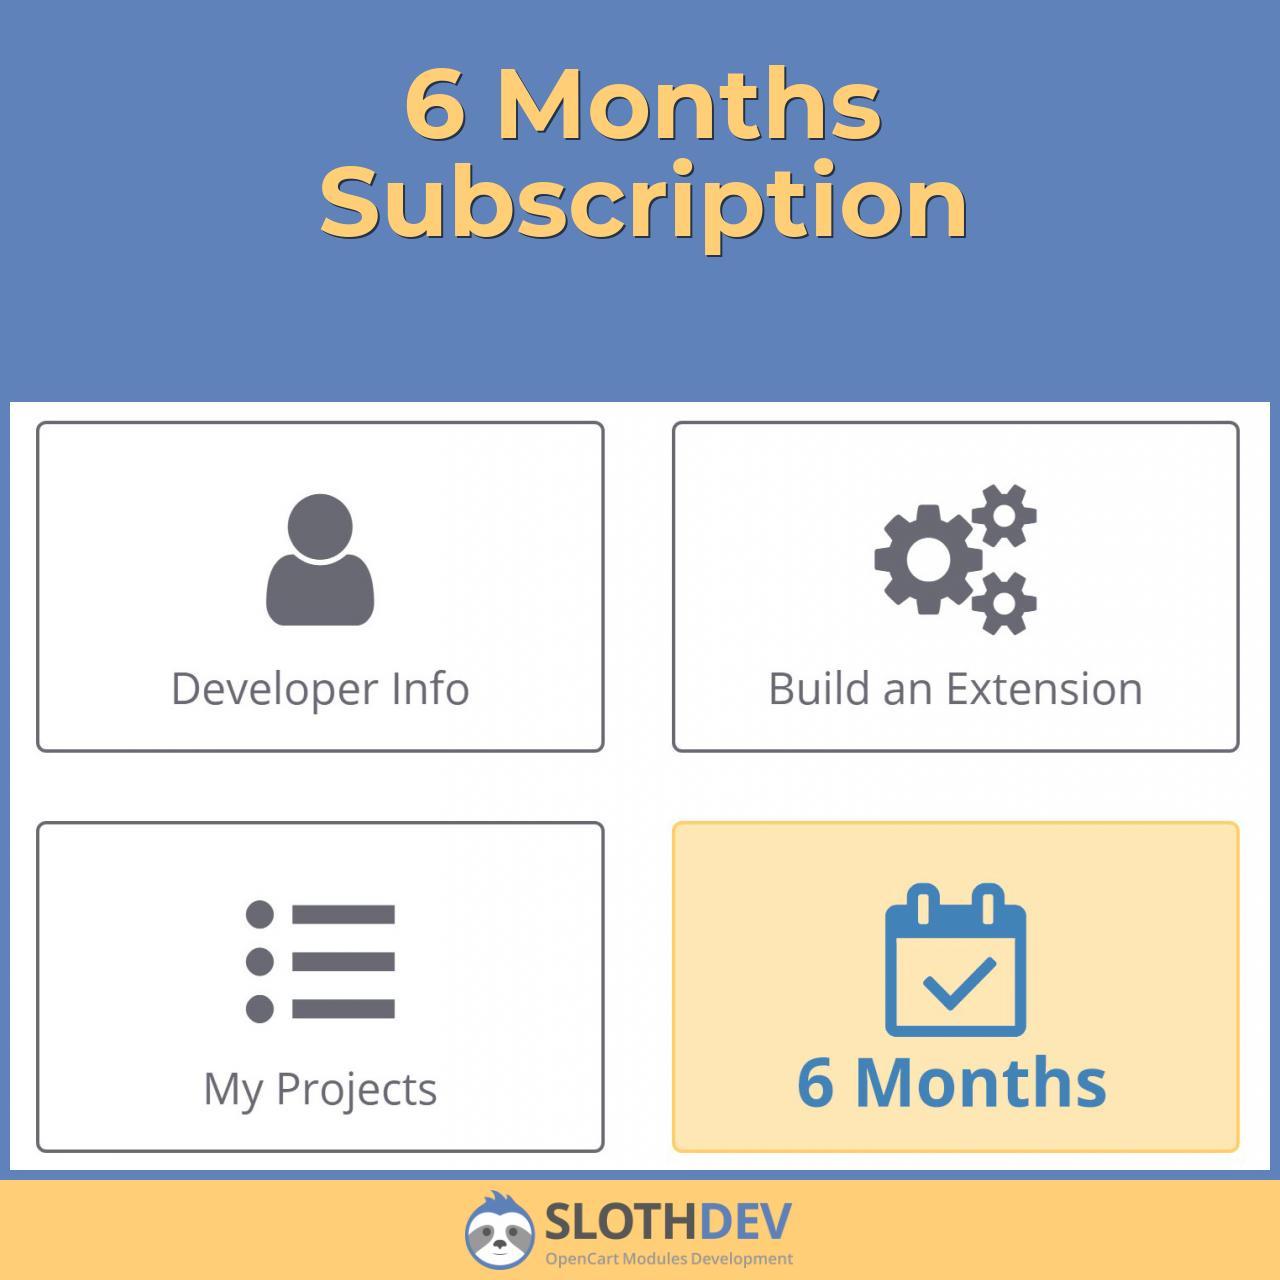 6 Months Subscription